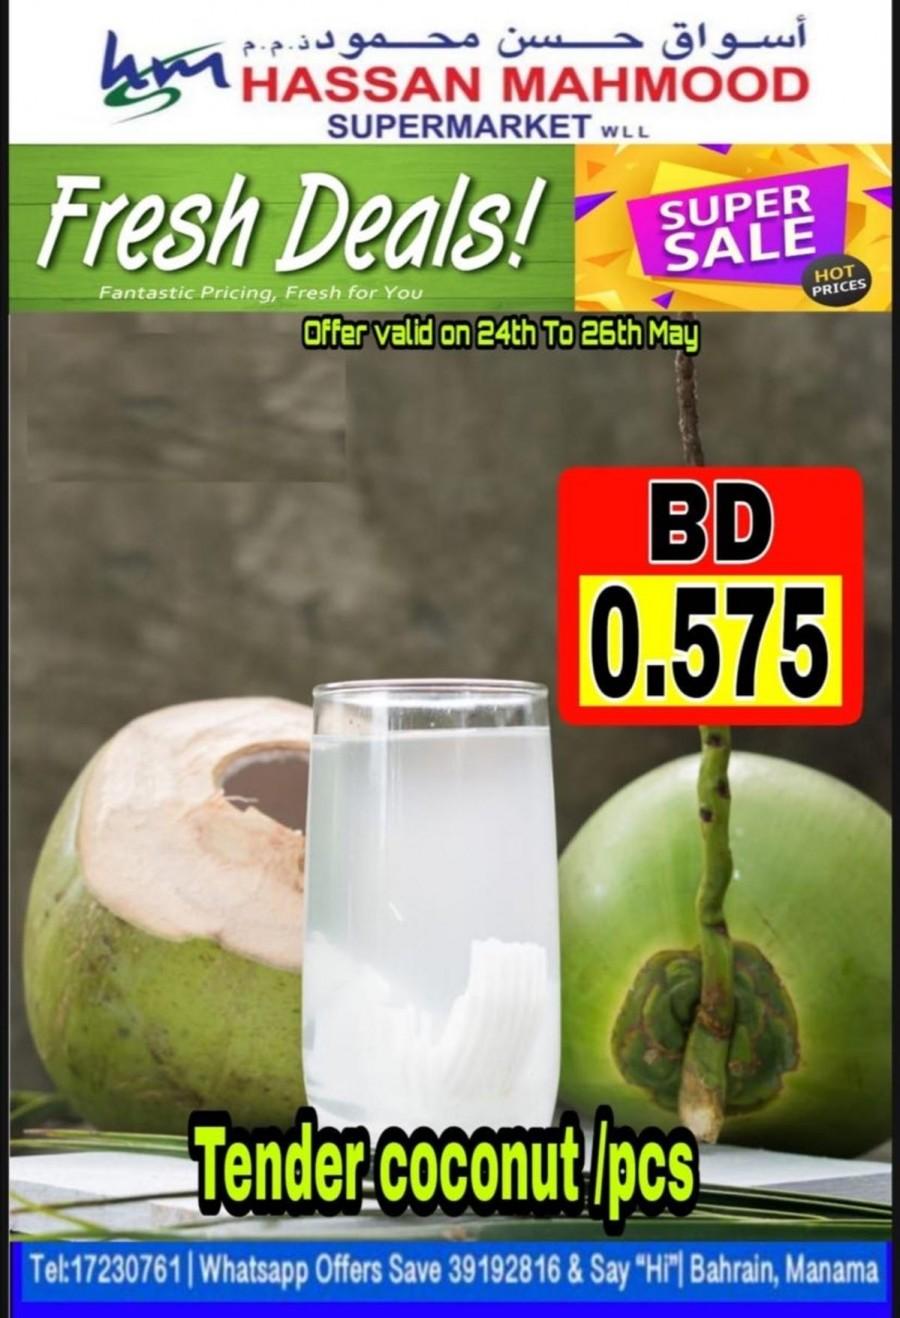 Super Sale Fresh Deals